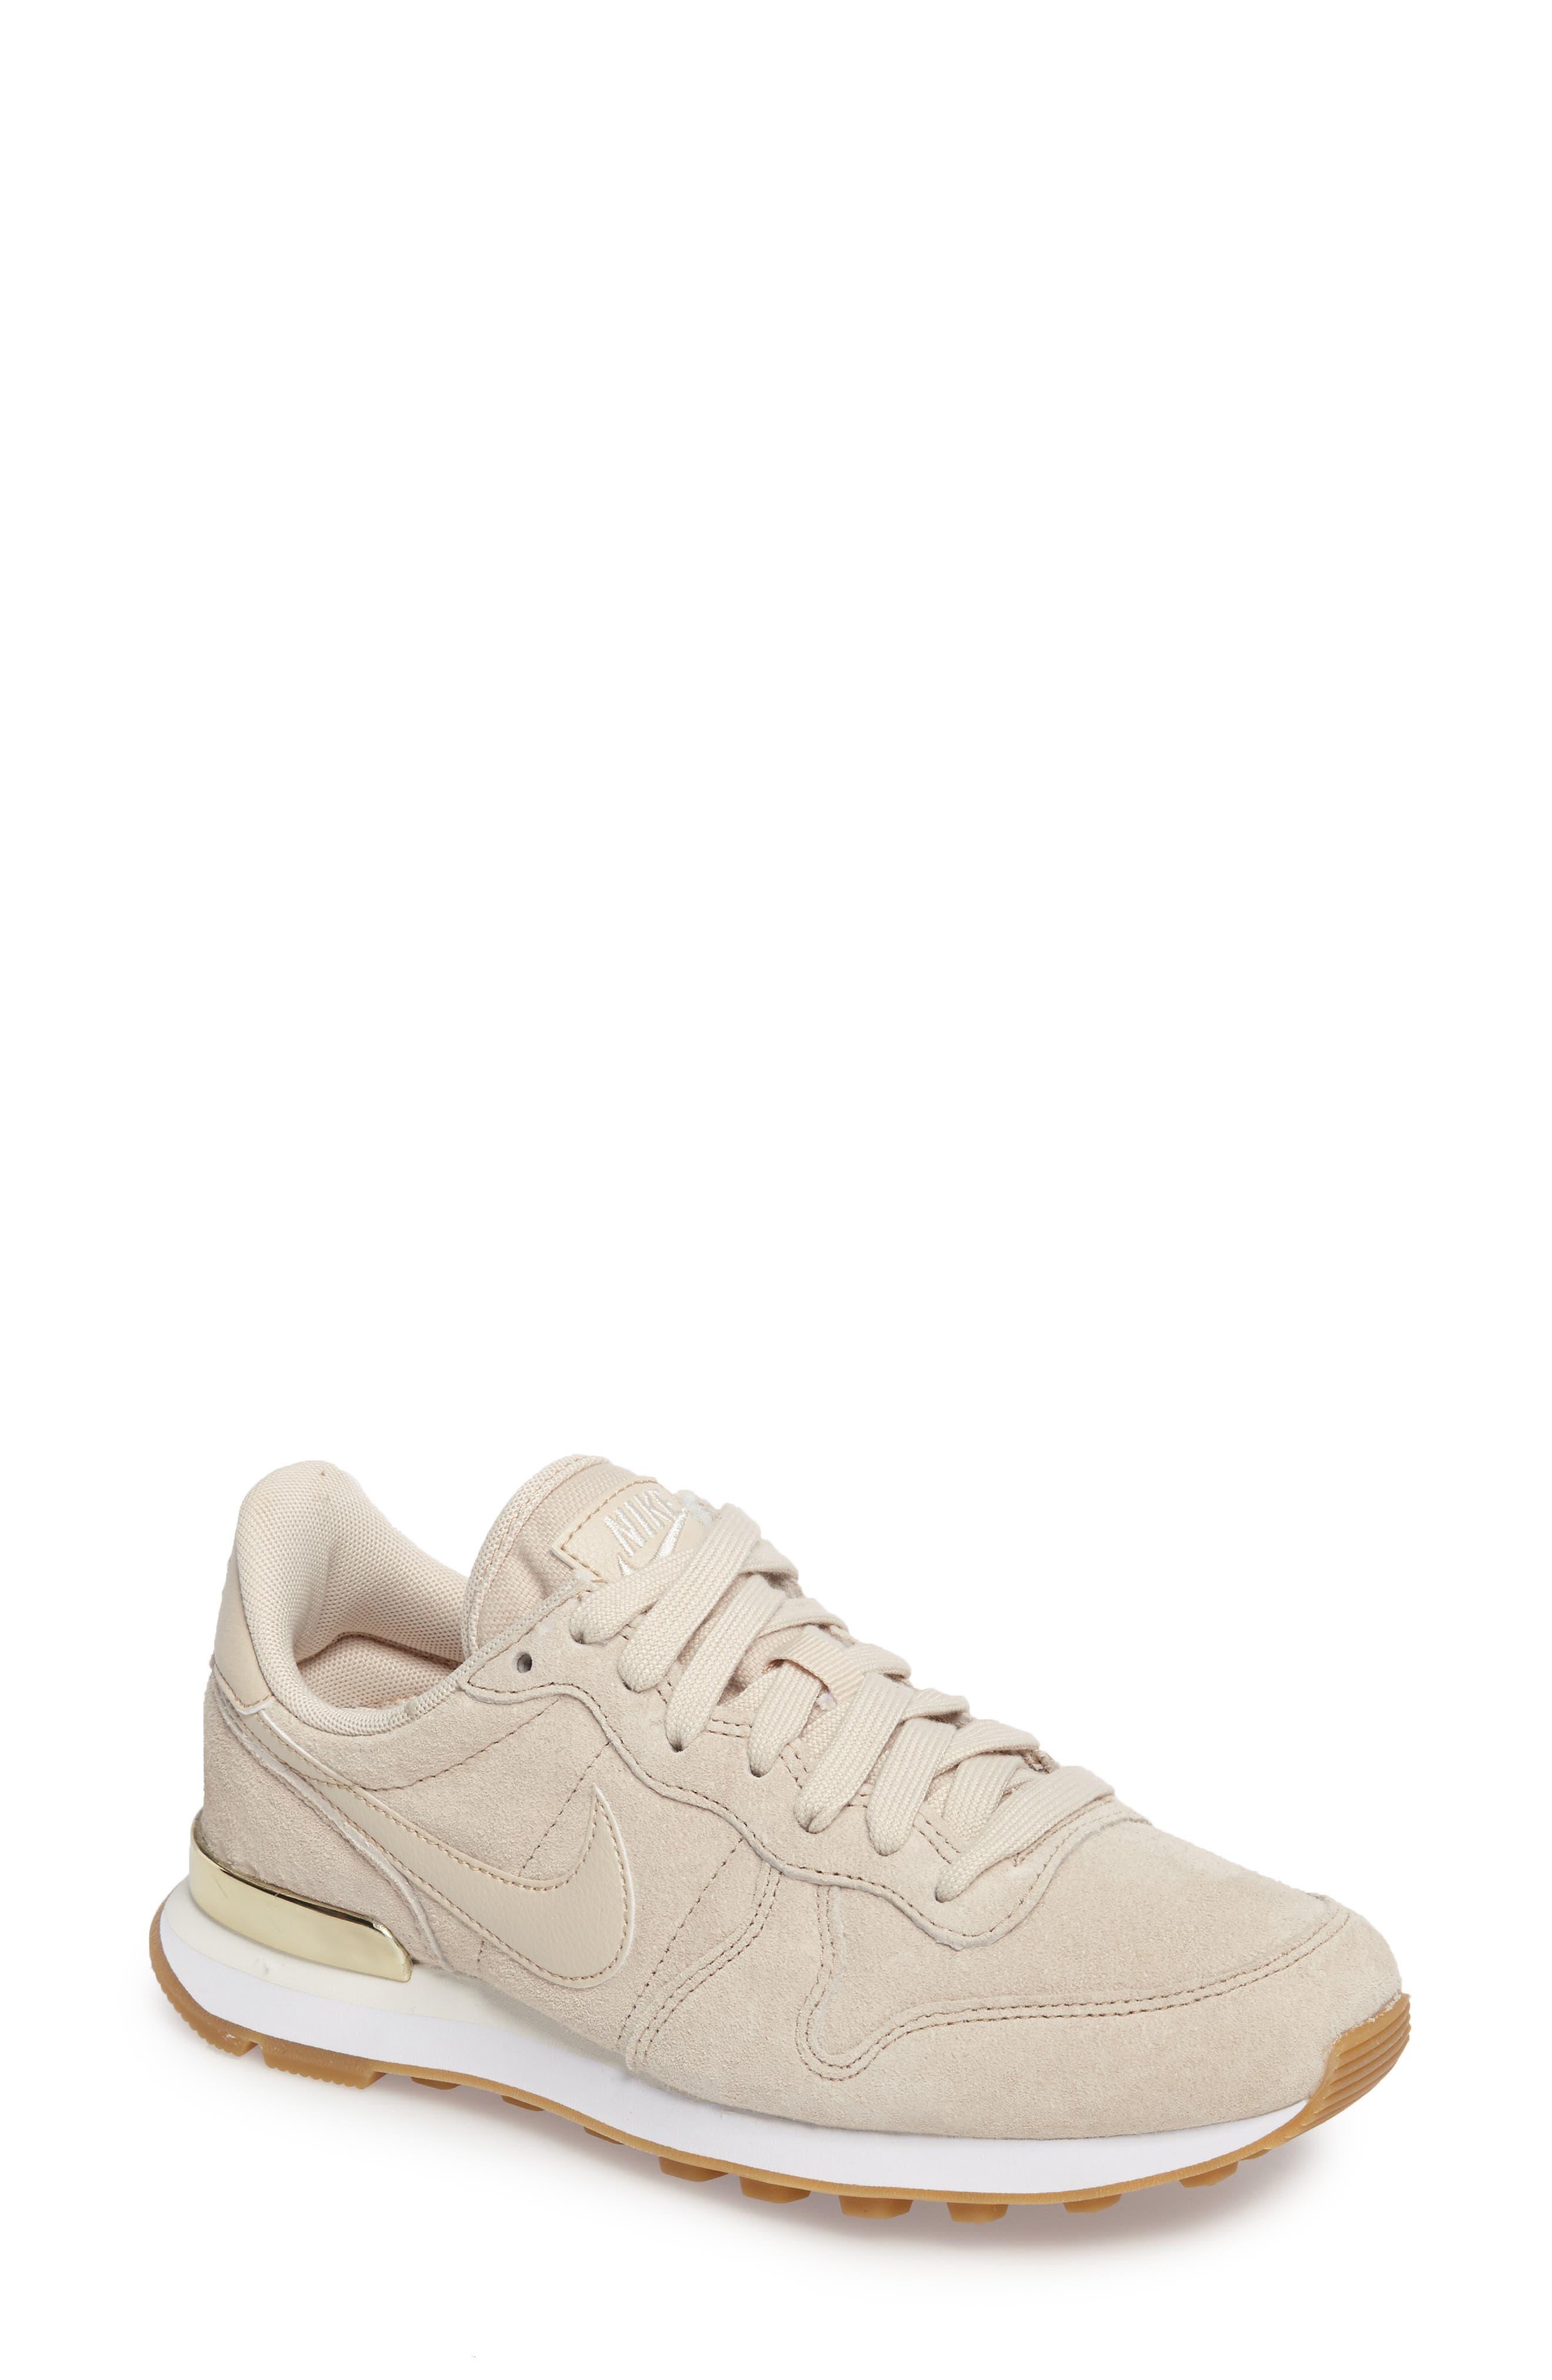 Main Image - Nike Internationalist SD Sneaker (Women)